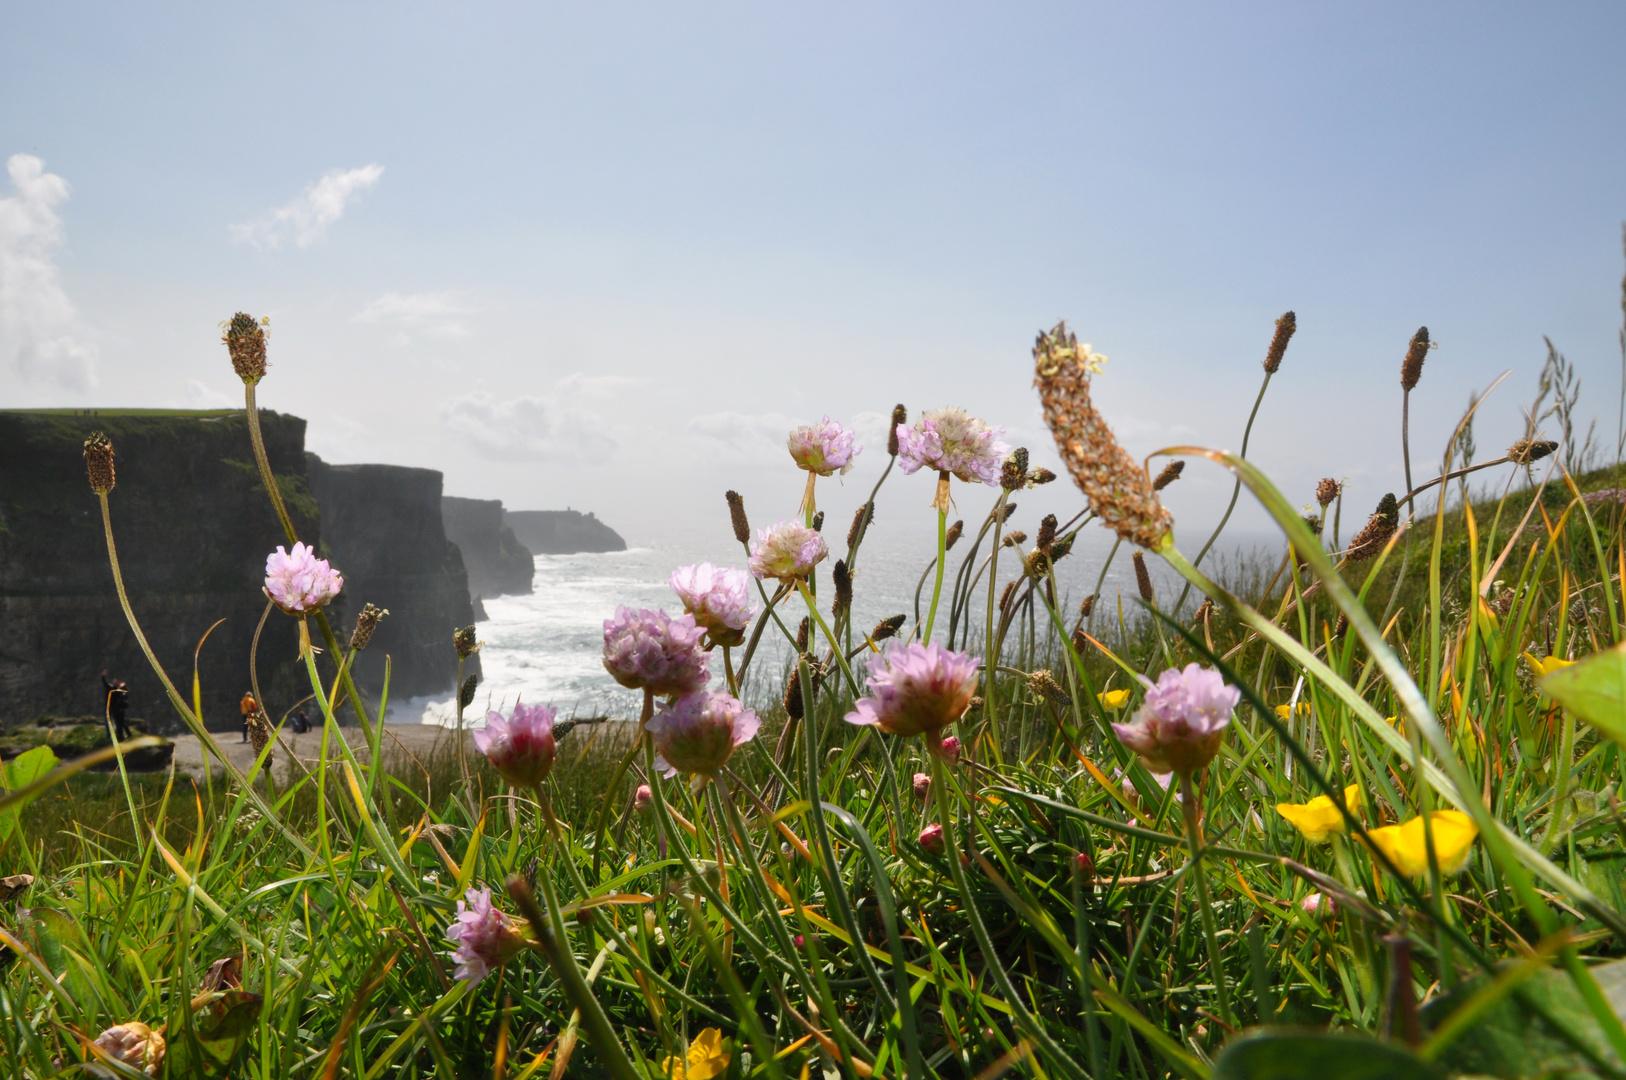 Cliffs of Moher - 05.2011 - H